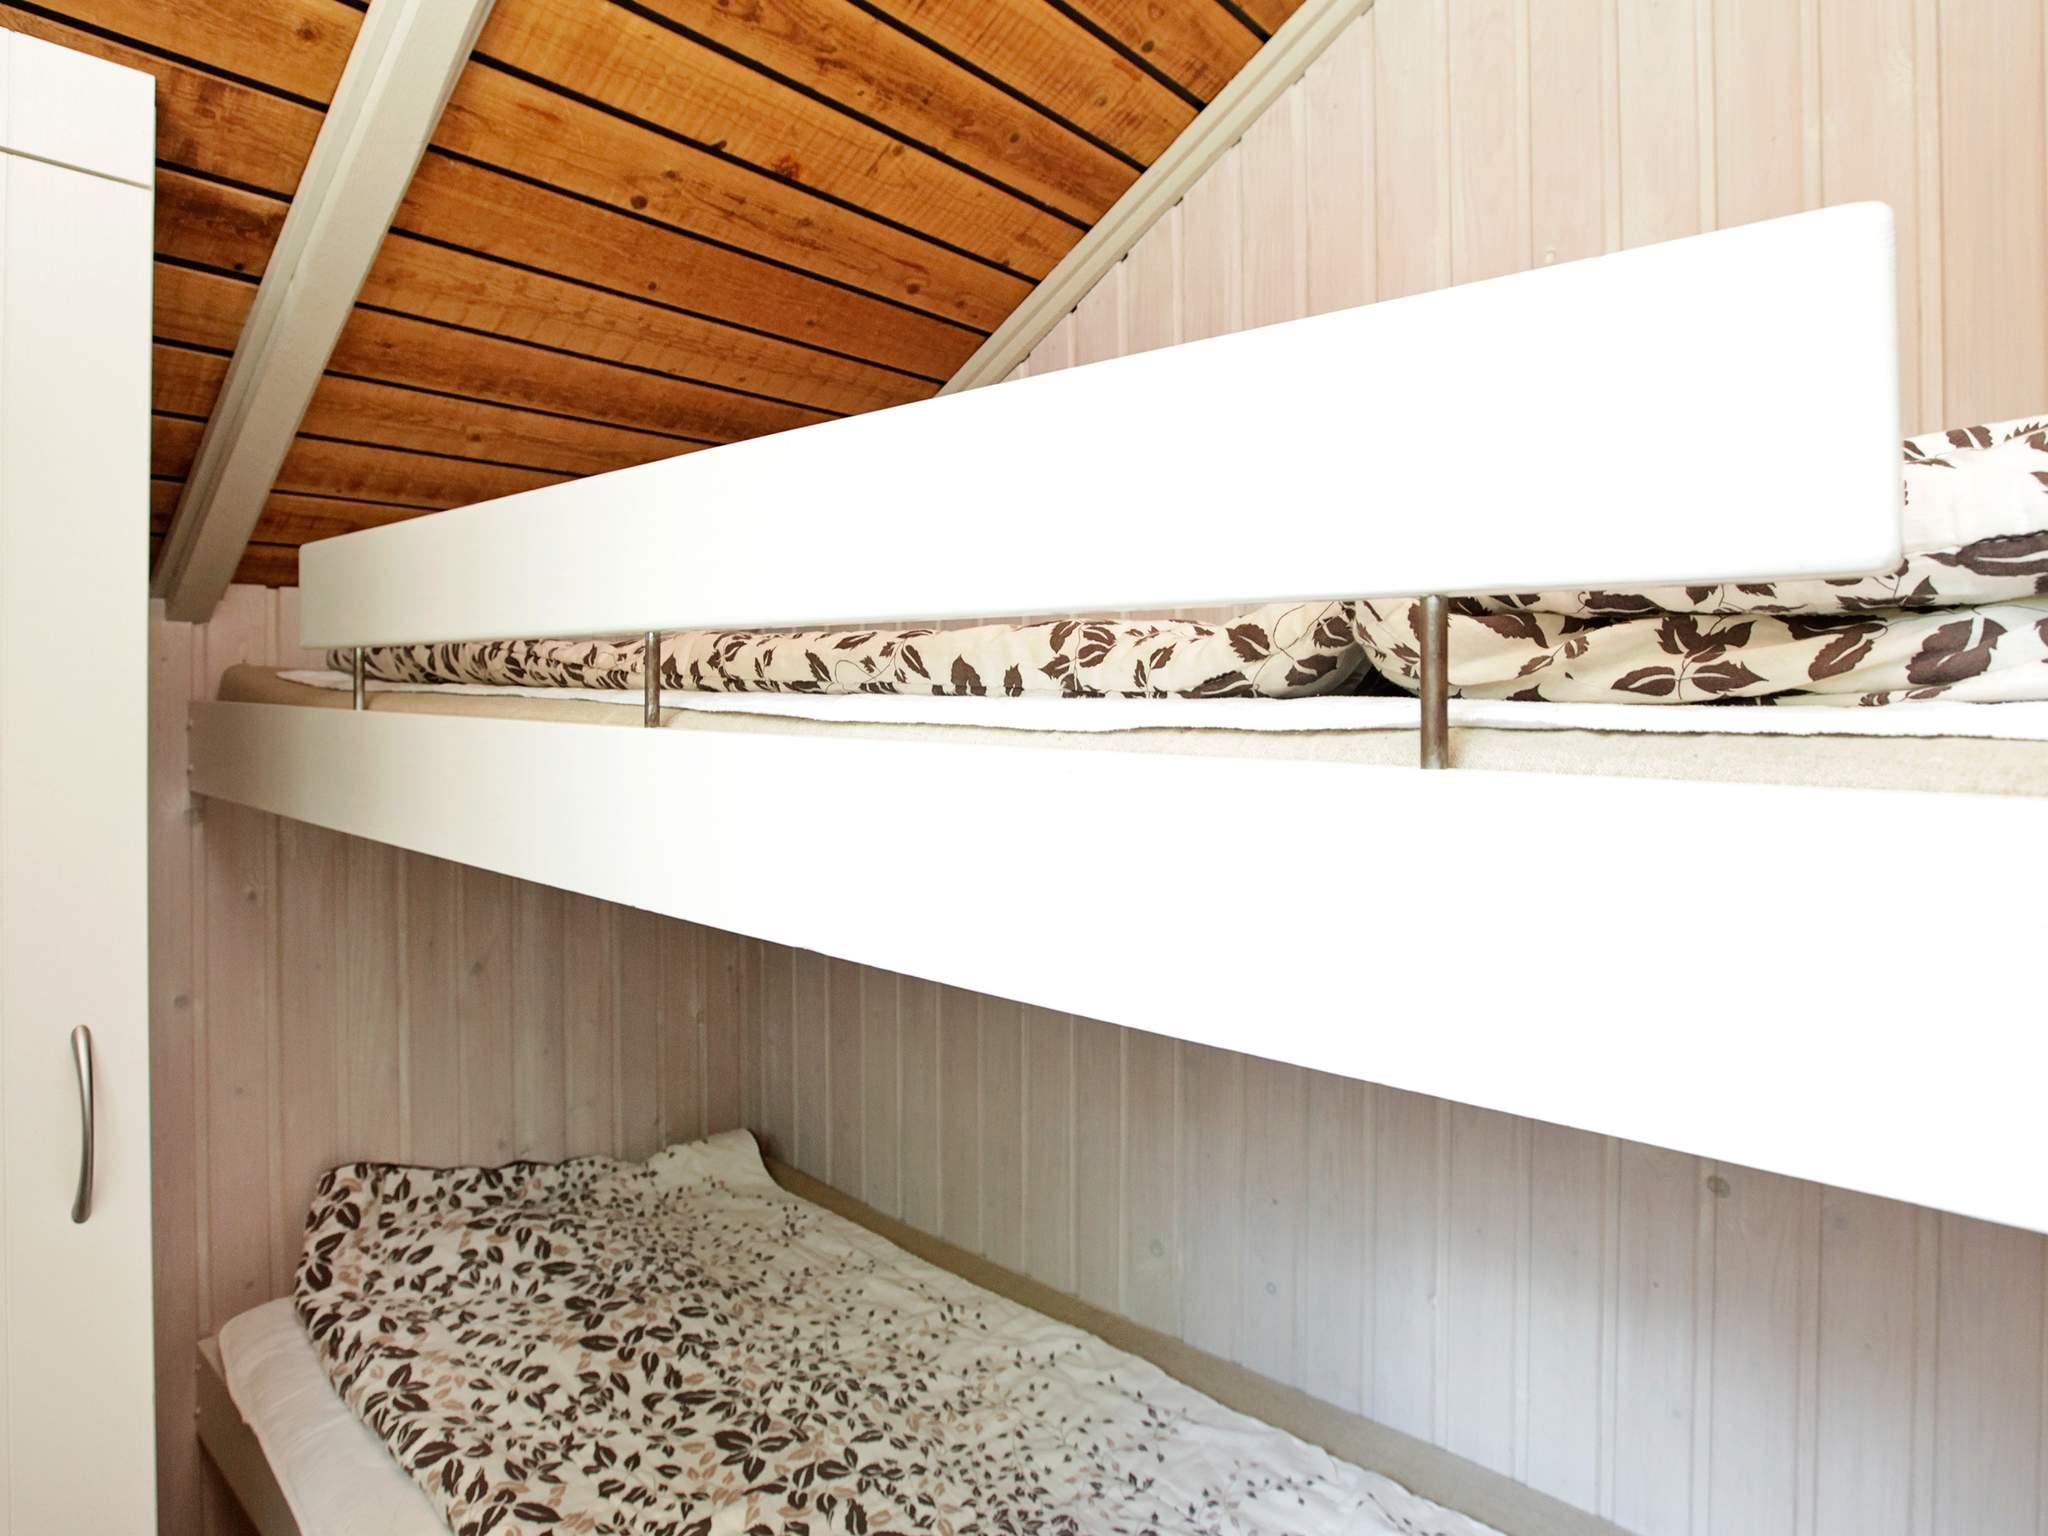 Ferienhaus Ristinge (82427), Ristinge, , Langeland, Dänemark, Bild 11